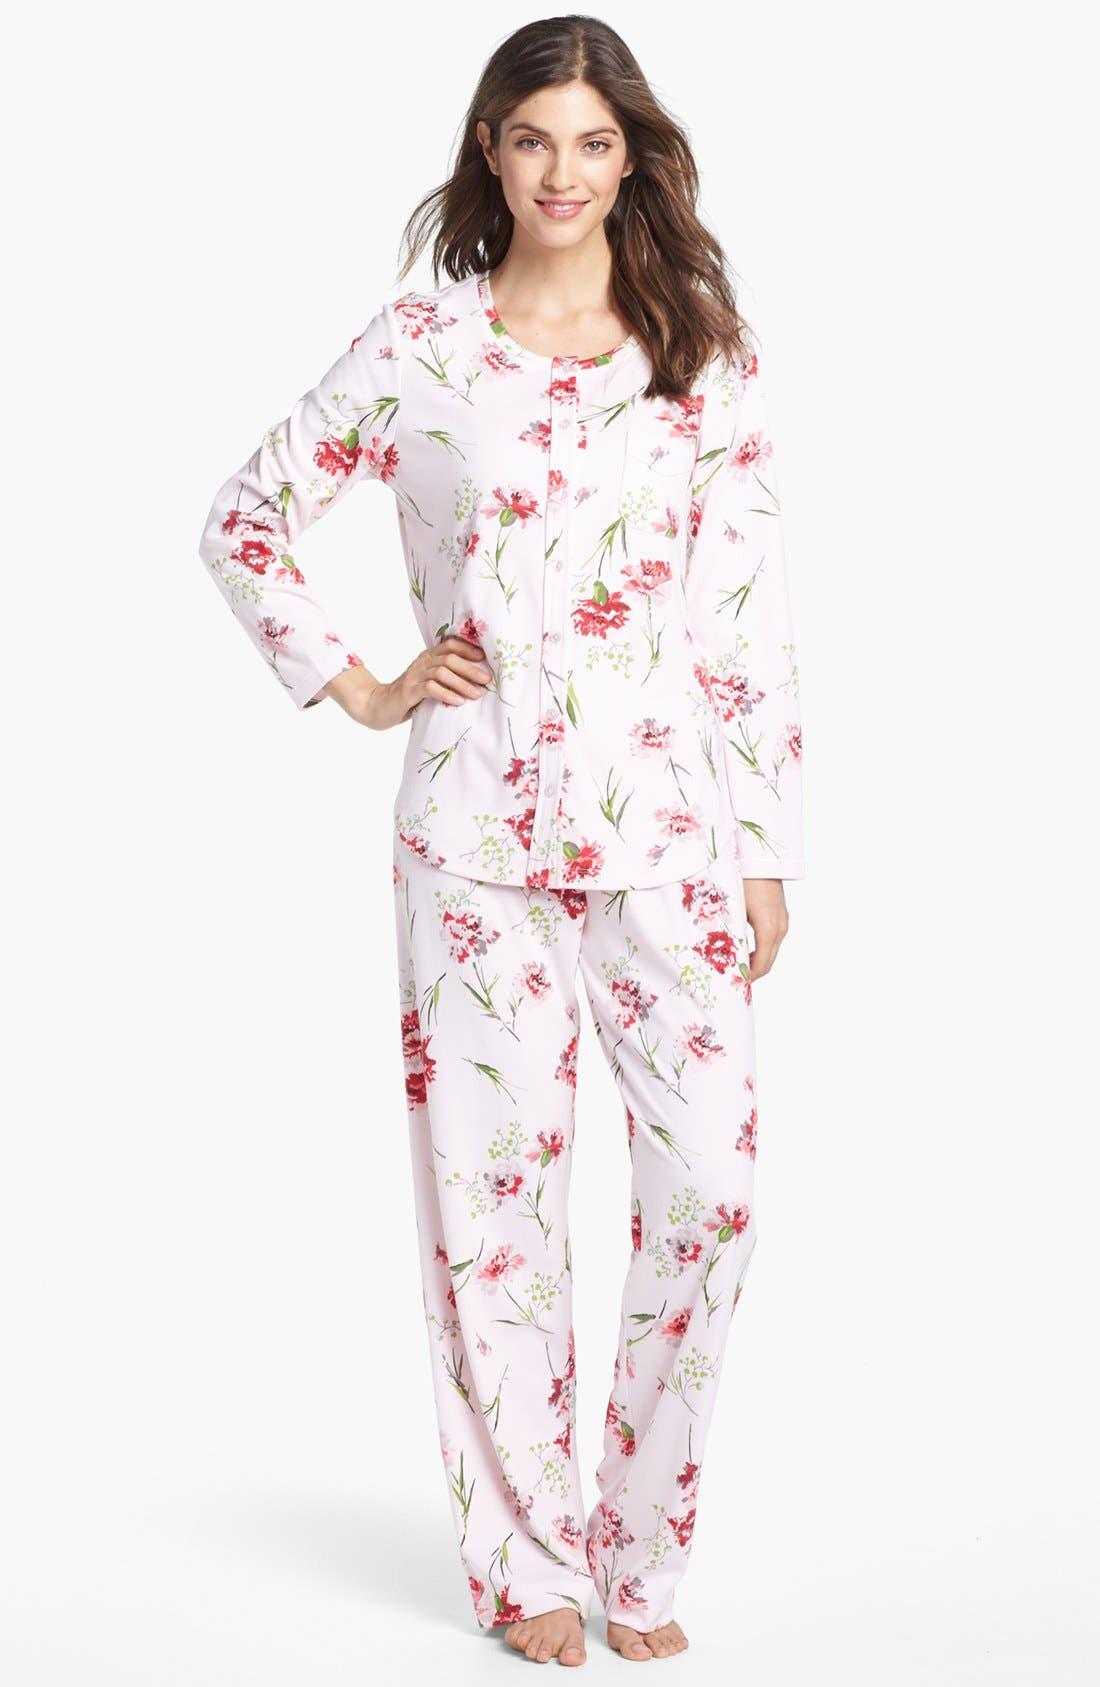 Alternate Image 1 Selected - Carole Hochman Designs Knit Pajamas